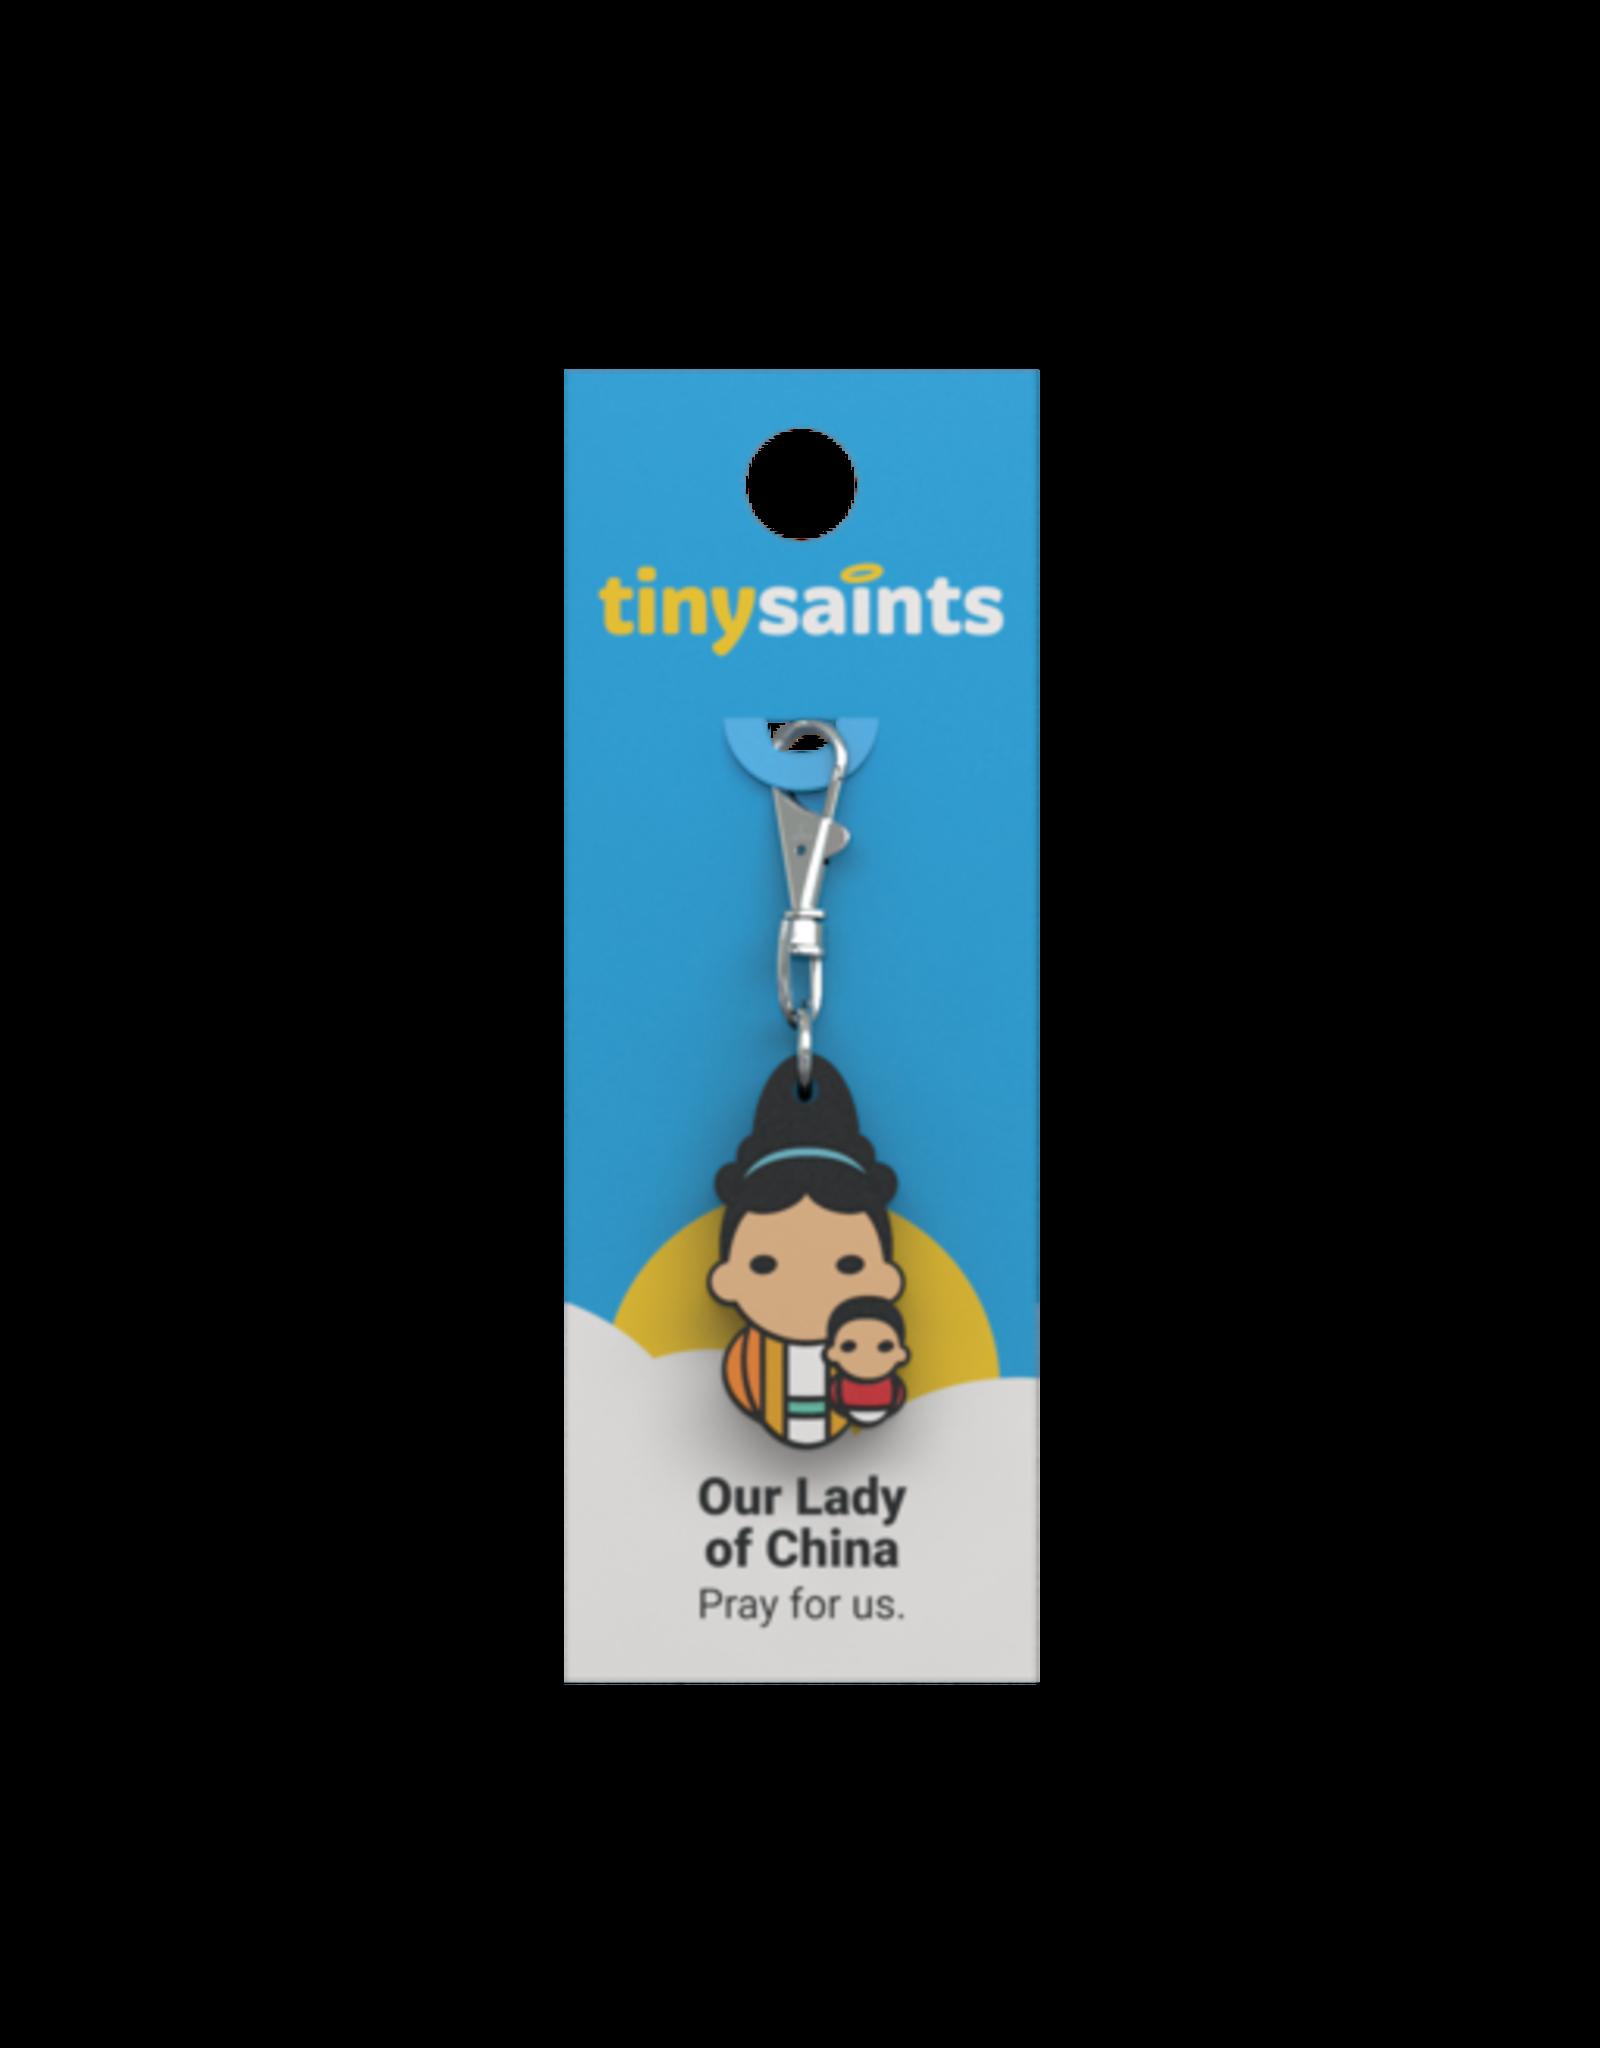 Tiny Saints Tiny Saints Charm - Our Lady of China